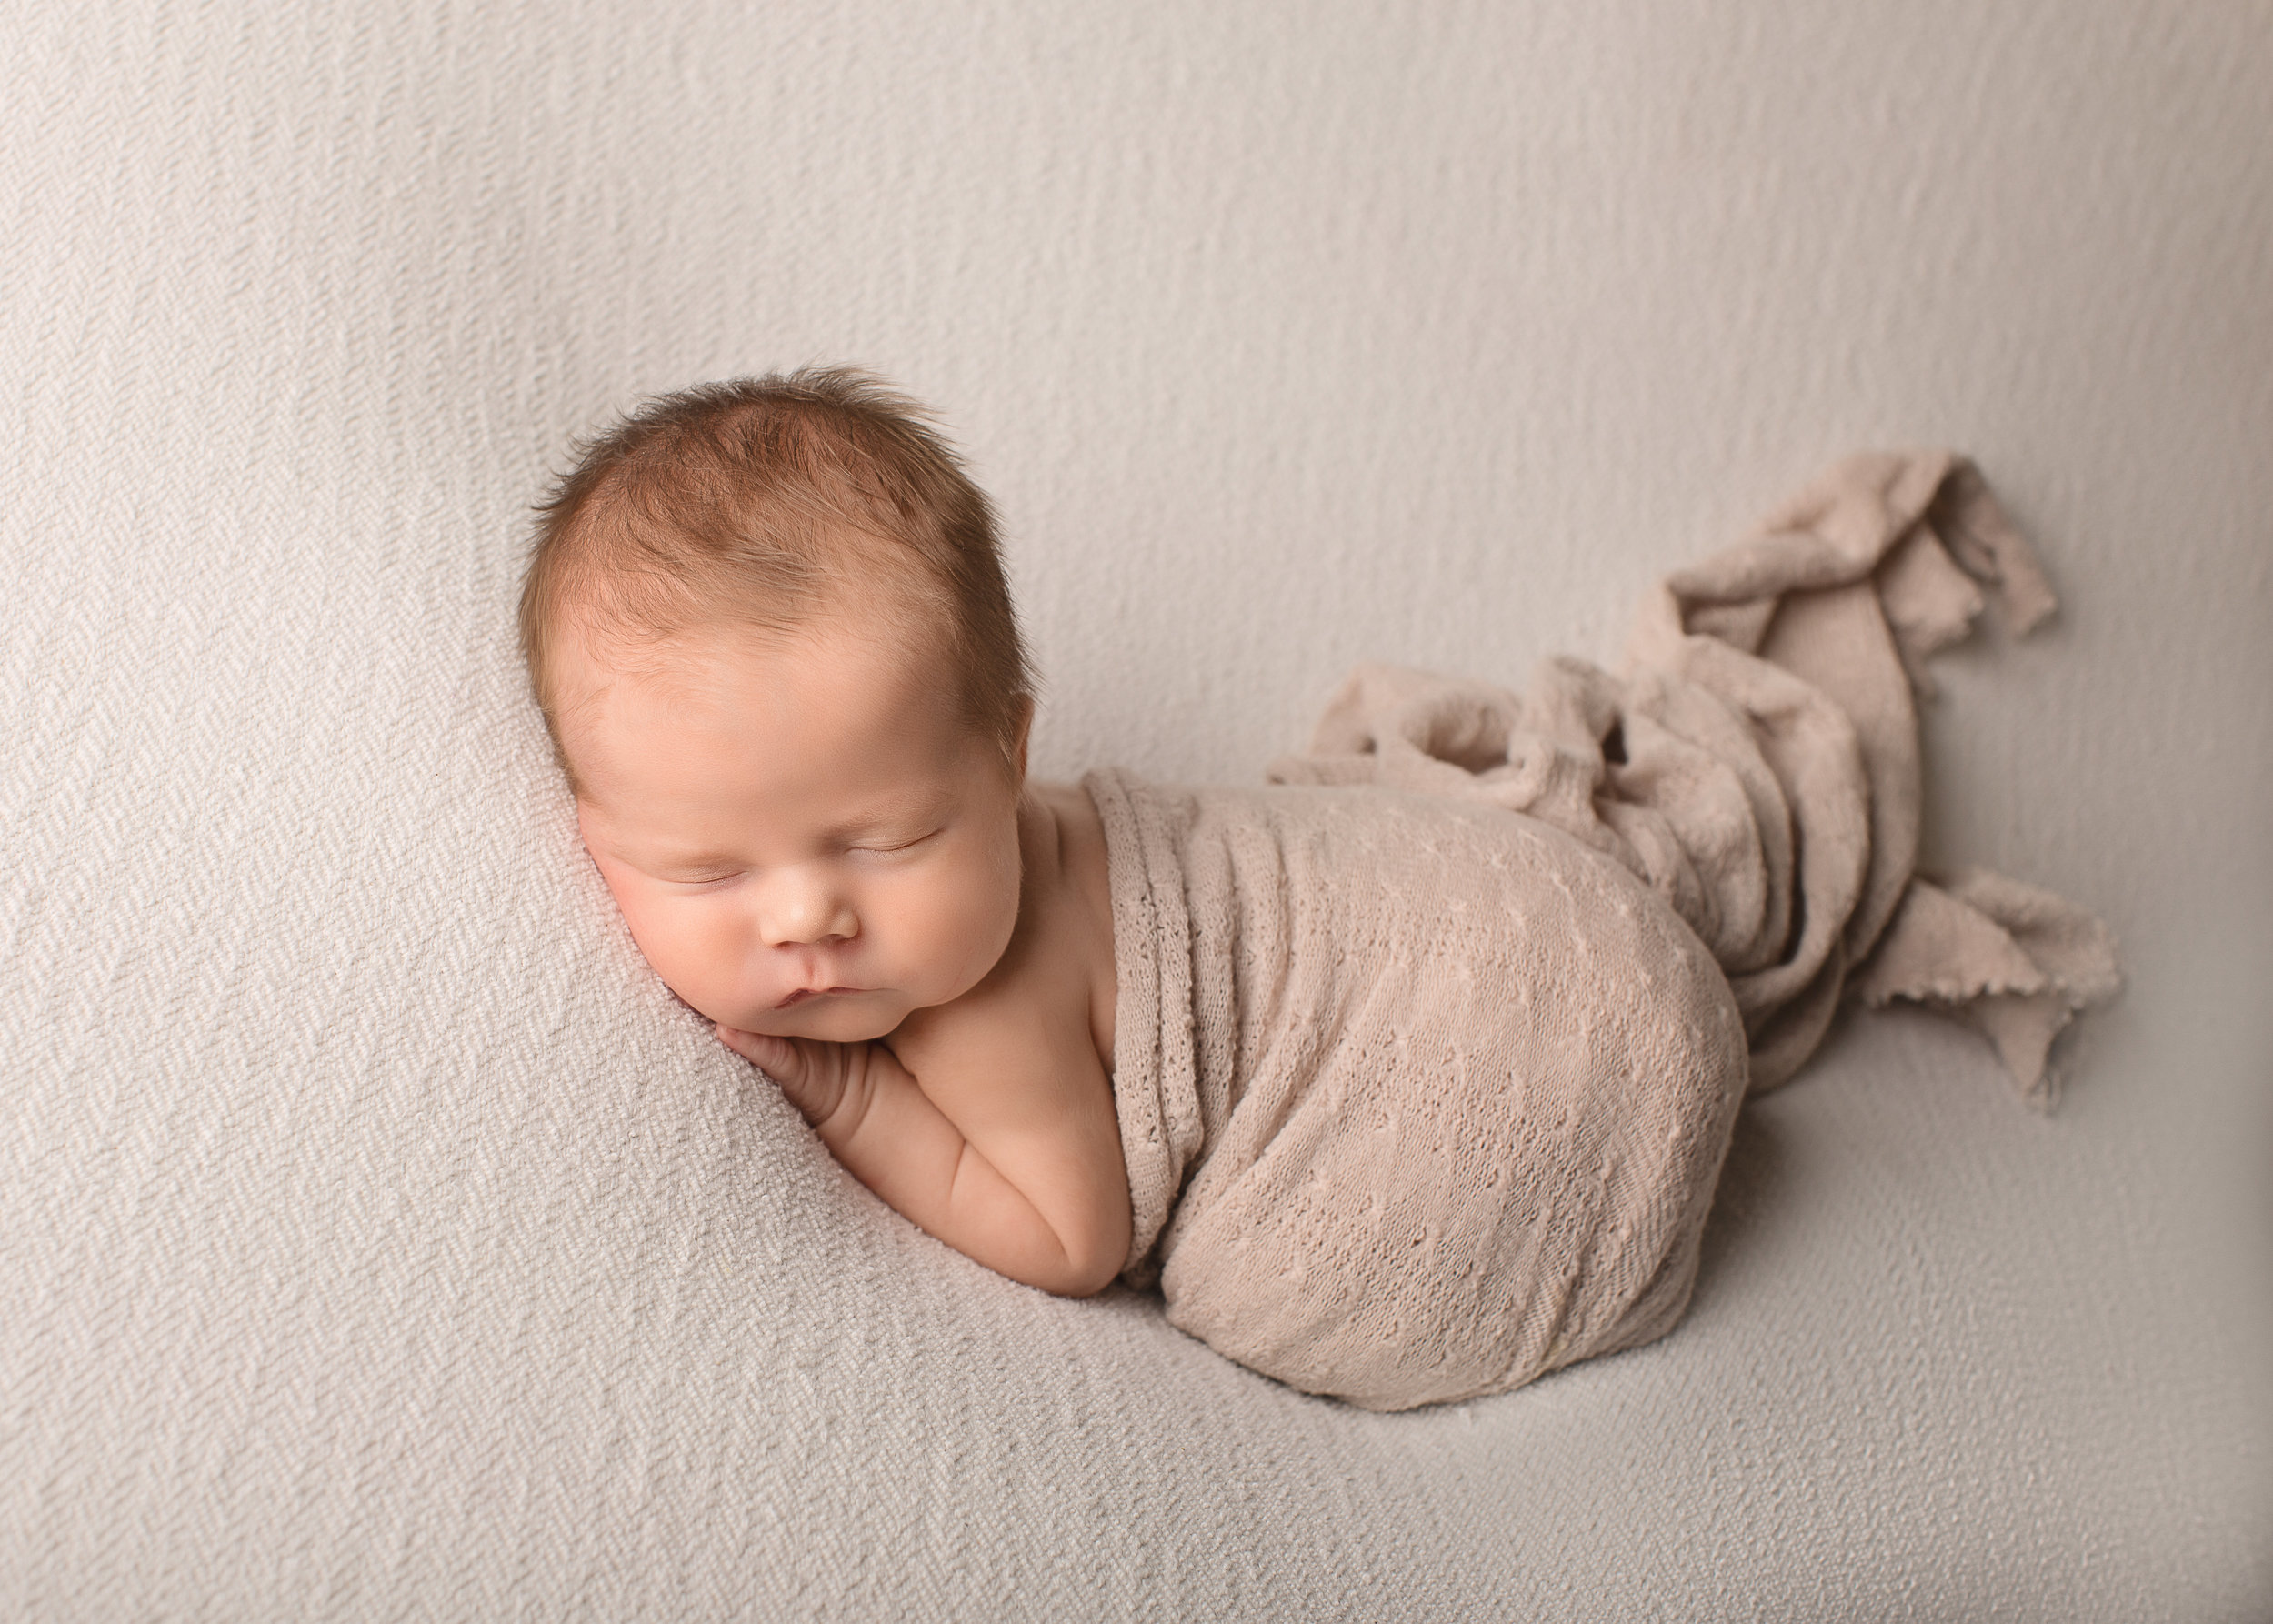 millbury_newborn_photographer_massachusetts_boston_baby_boy_photos8.jpg